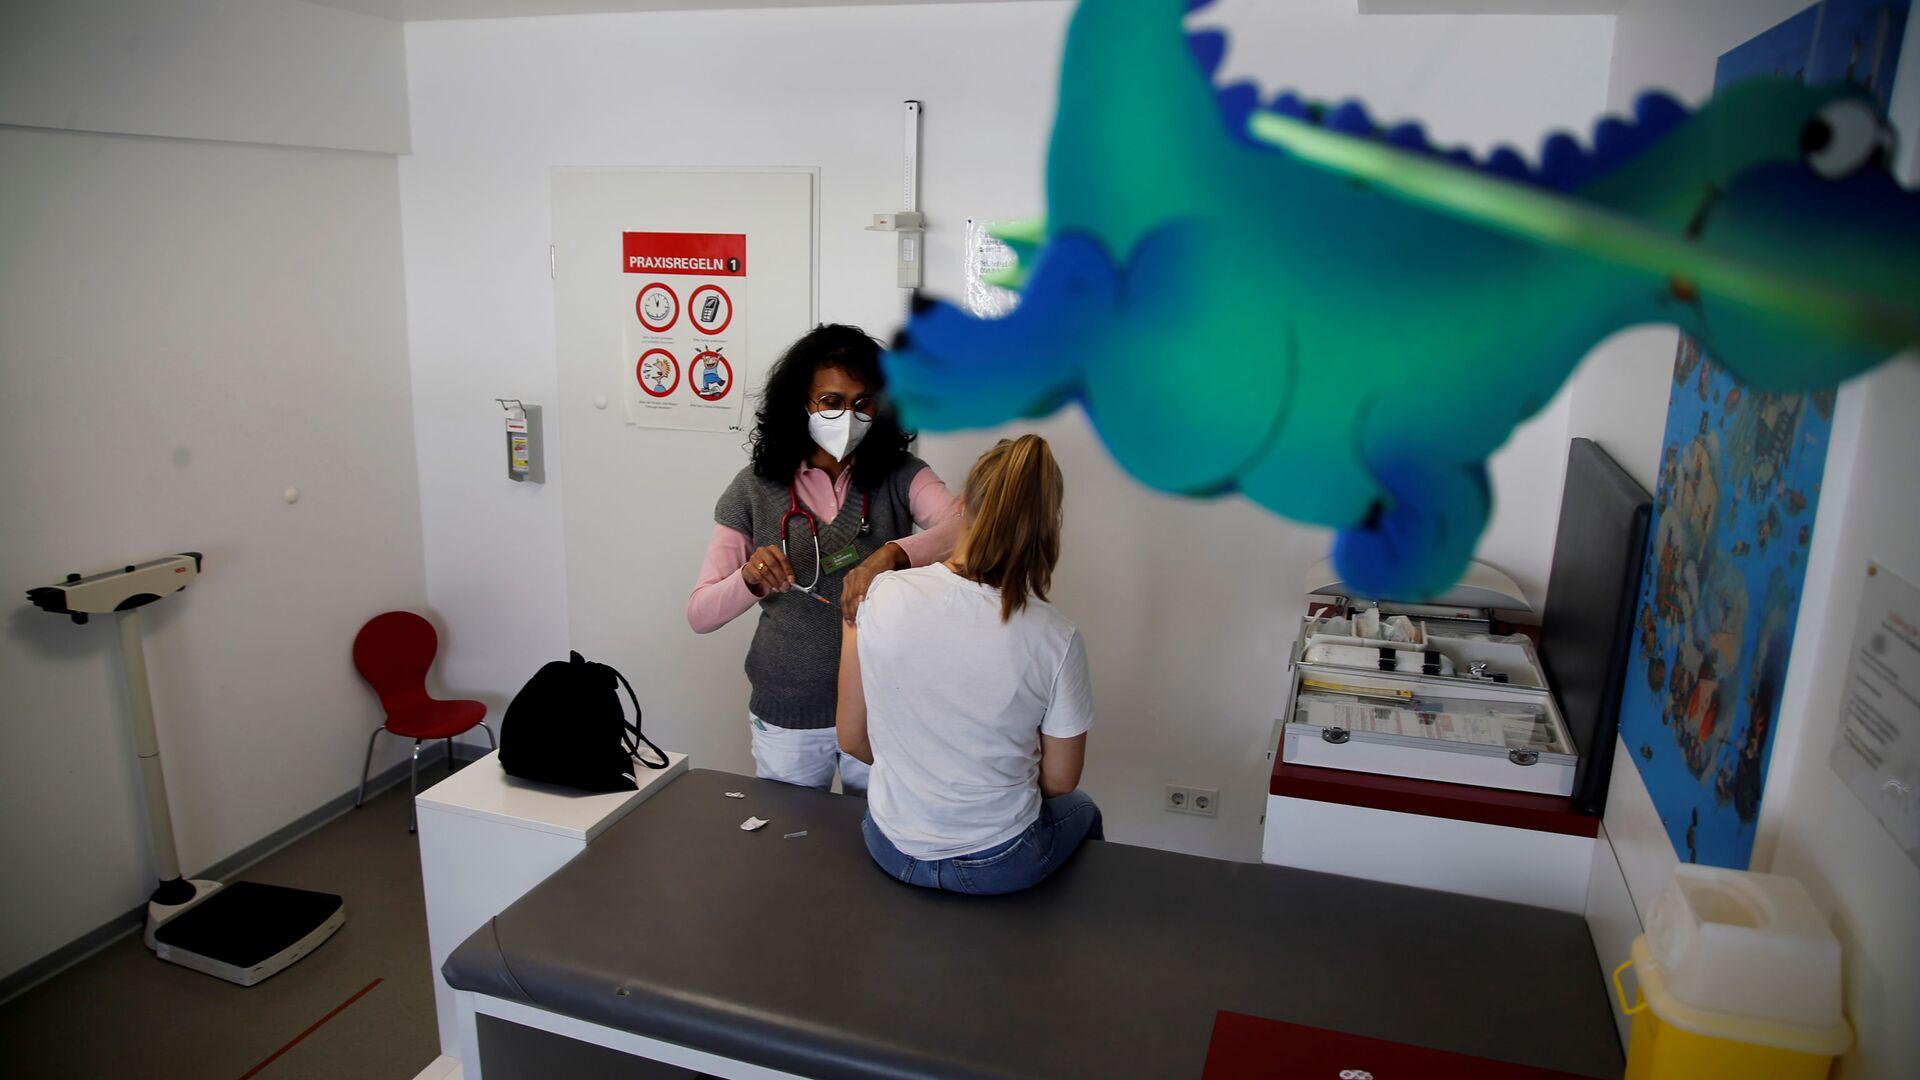 Вакцинация девушки от короновируса  вакциной Pfizer-BioNtech COVID-19 в Бонне, Германия, 21 мая 2021 - Sputnik Азербайджан, 1920, 26.08.2021